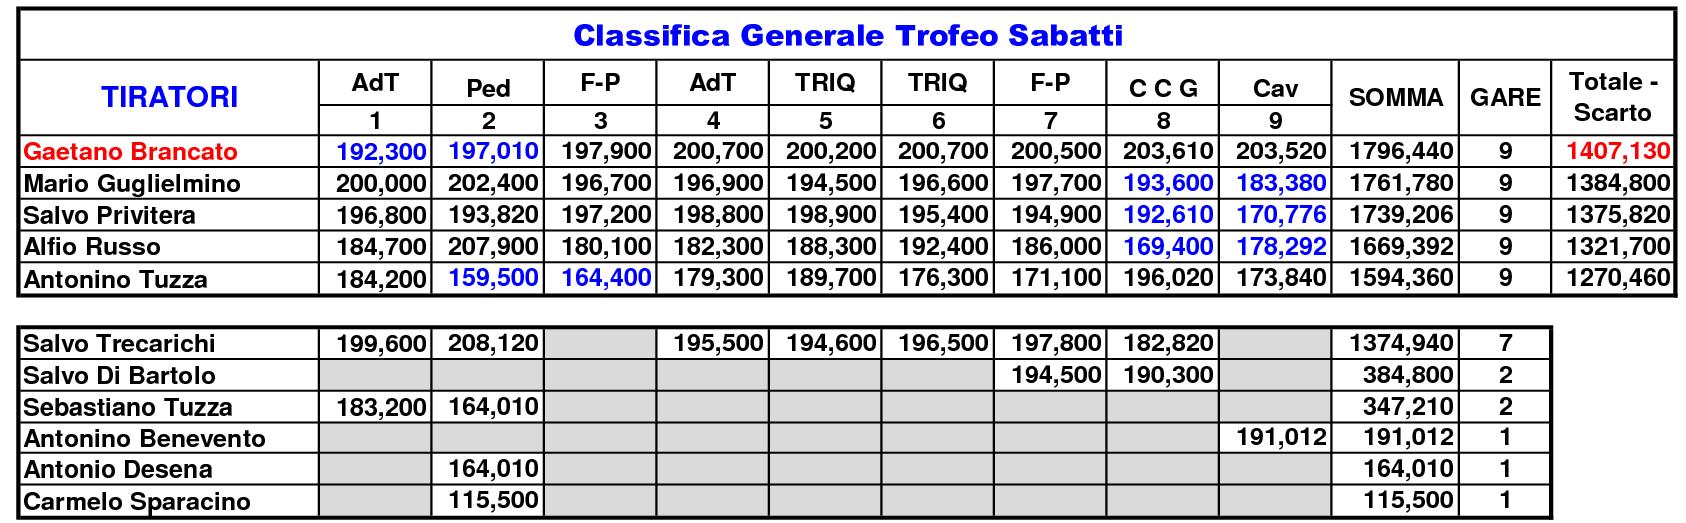 Classifica Generale 202014